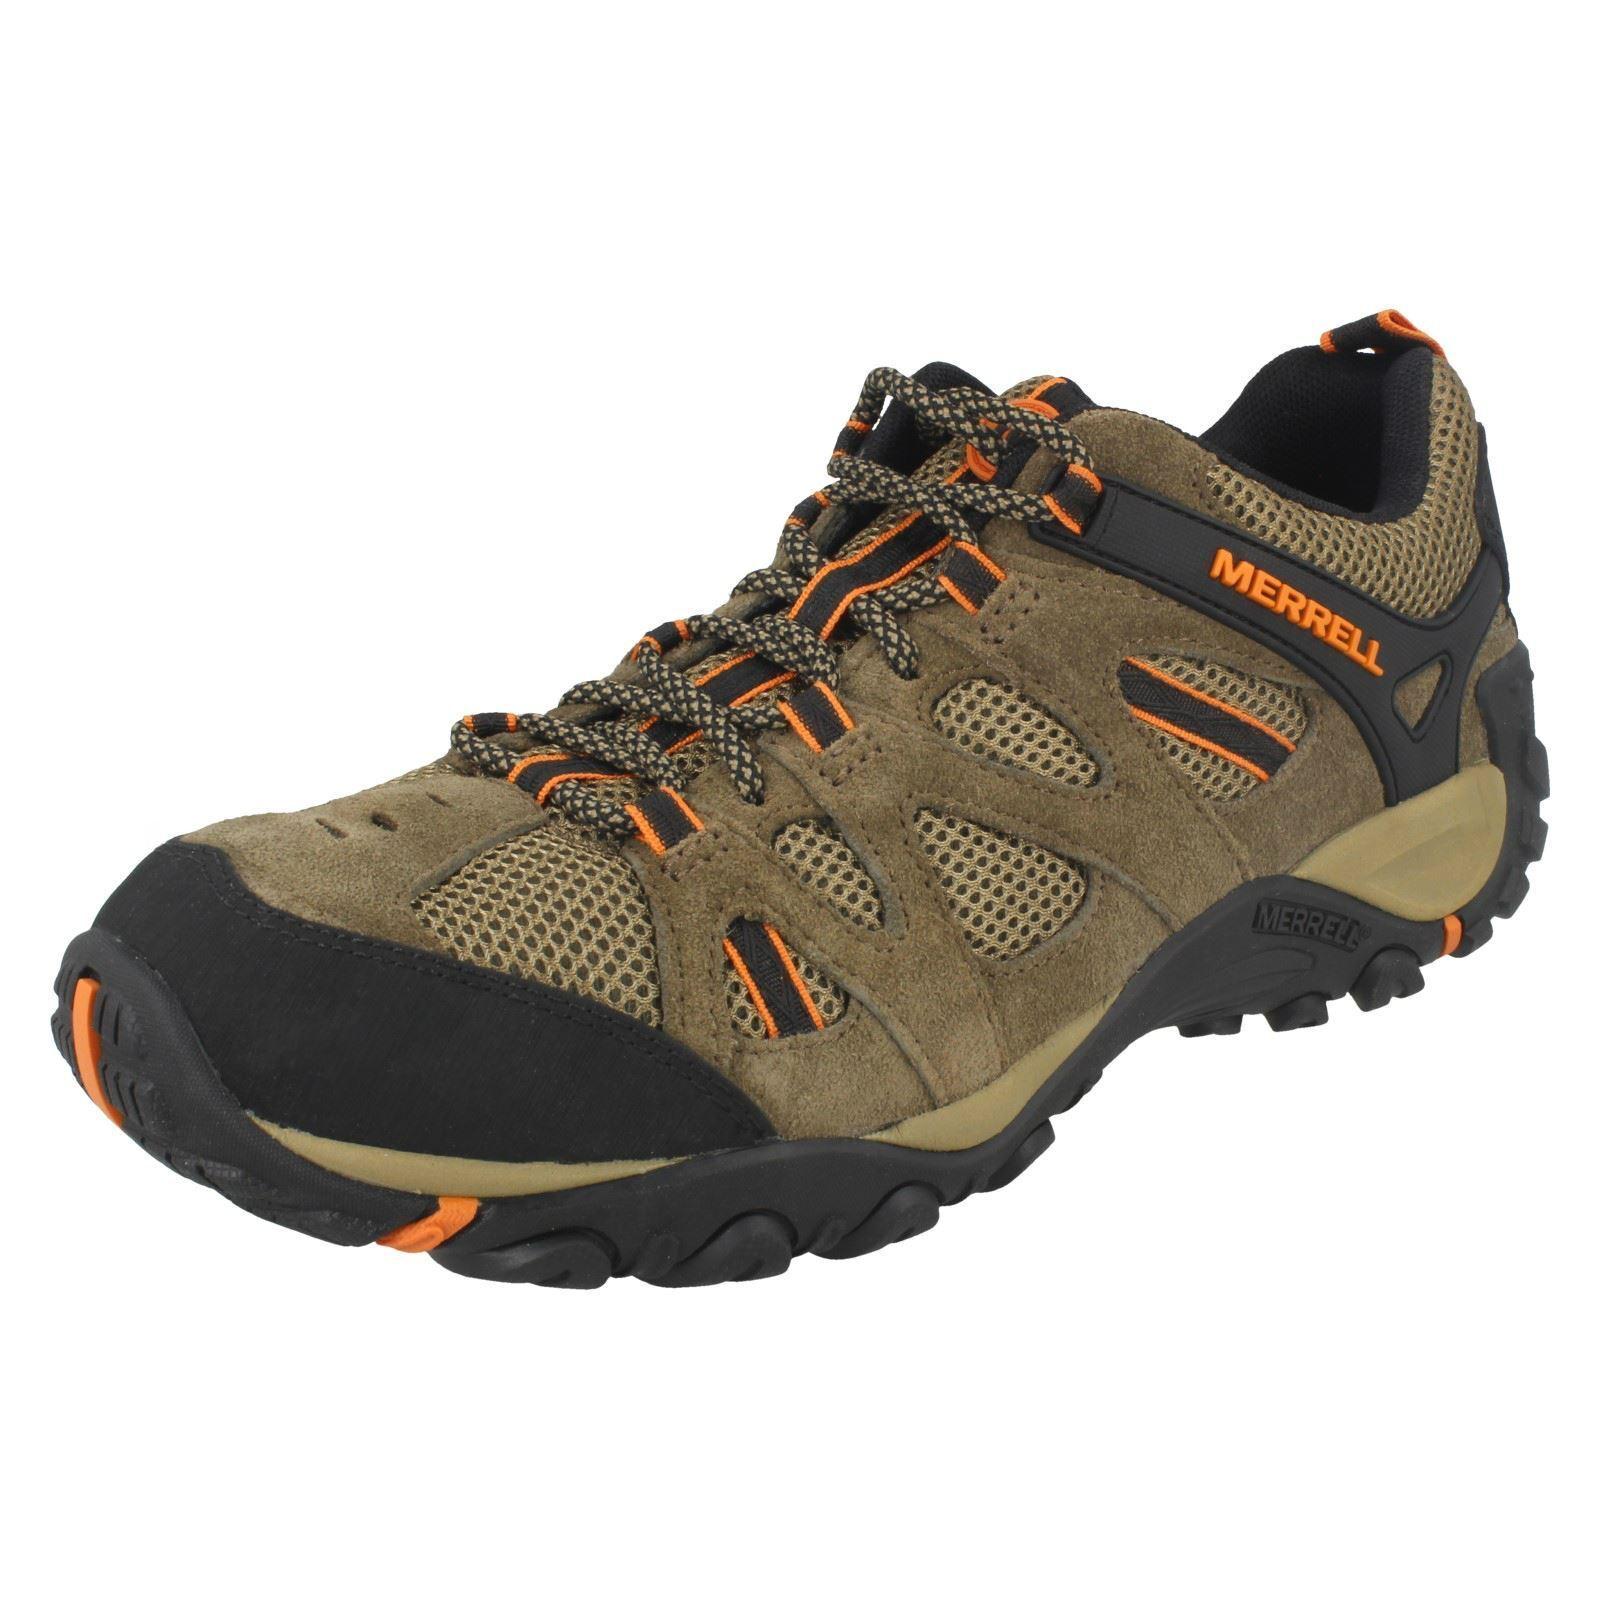 Mens Merrell Casual Lace Up Leather Walking shoes Yokota Ascender Vent J343718C